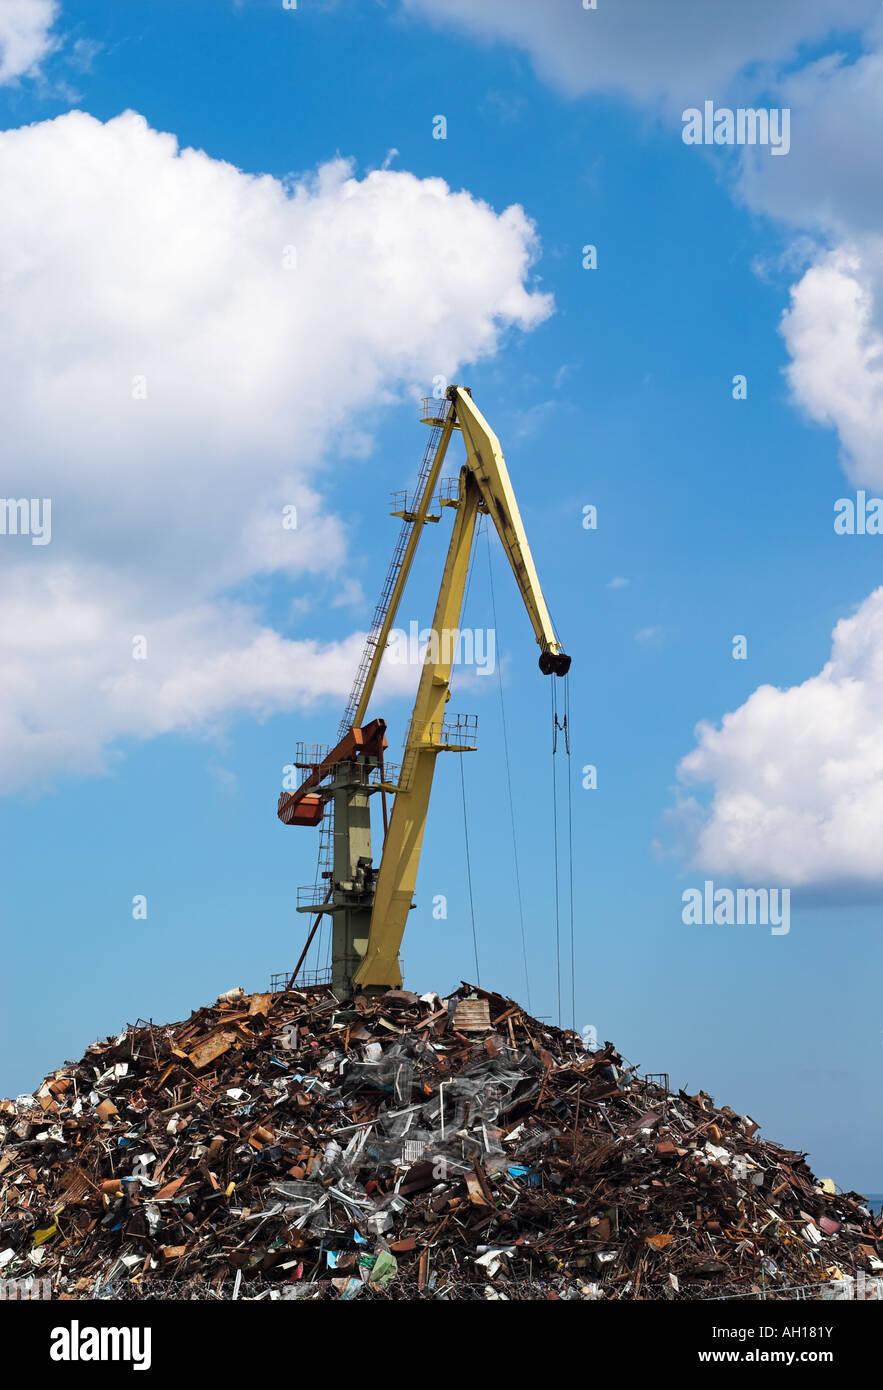 Harbour crane loading metal scrap in port - Stock Image